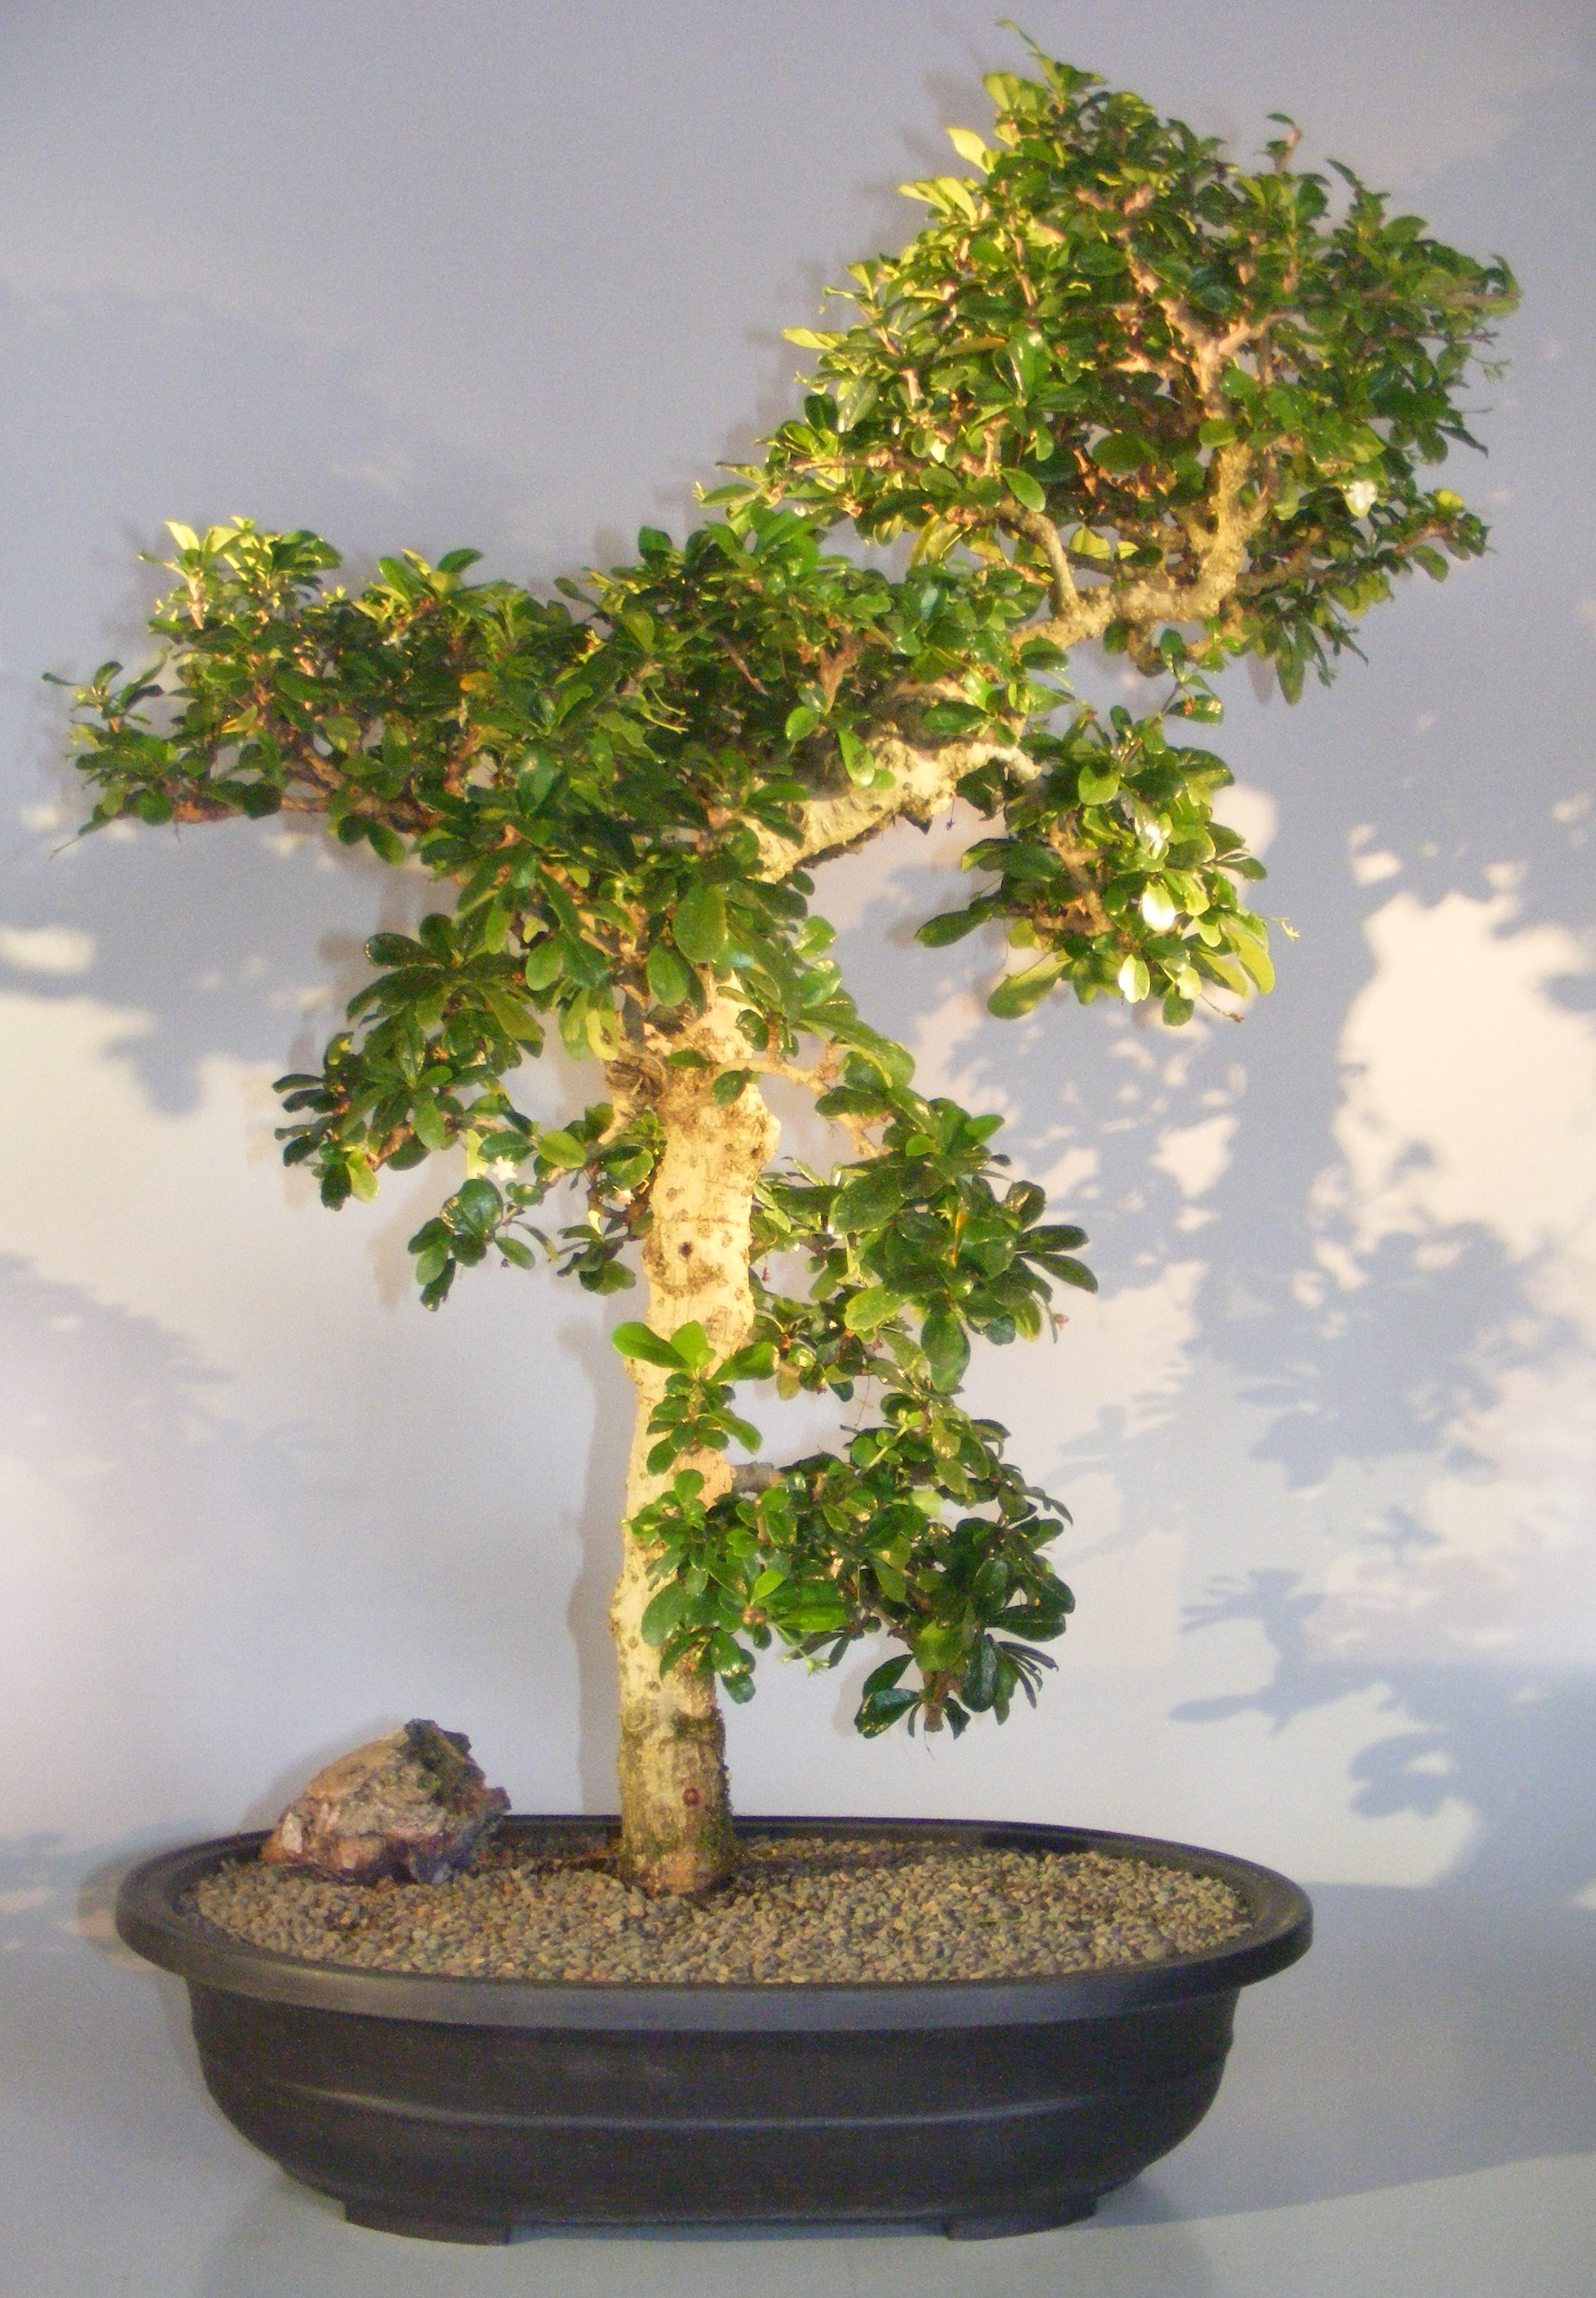 Flowering Fukien Tea Bonsai TreeCurved Trunk & Tiered Branching(ehretia microphylla) Image